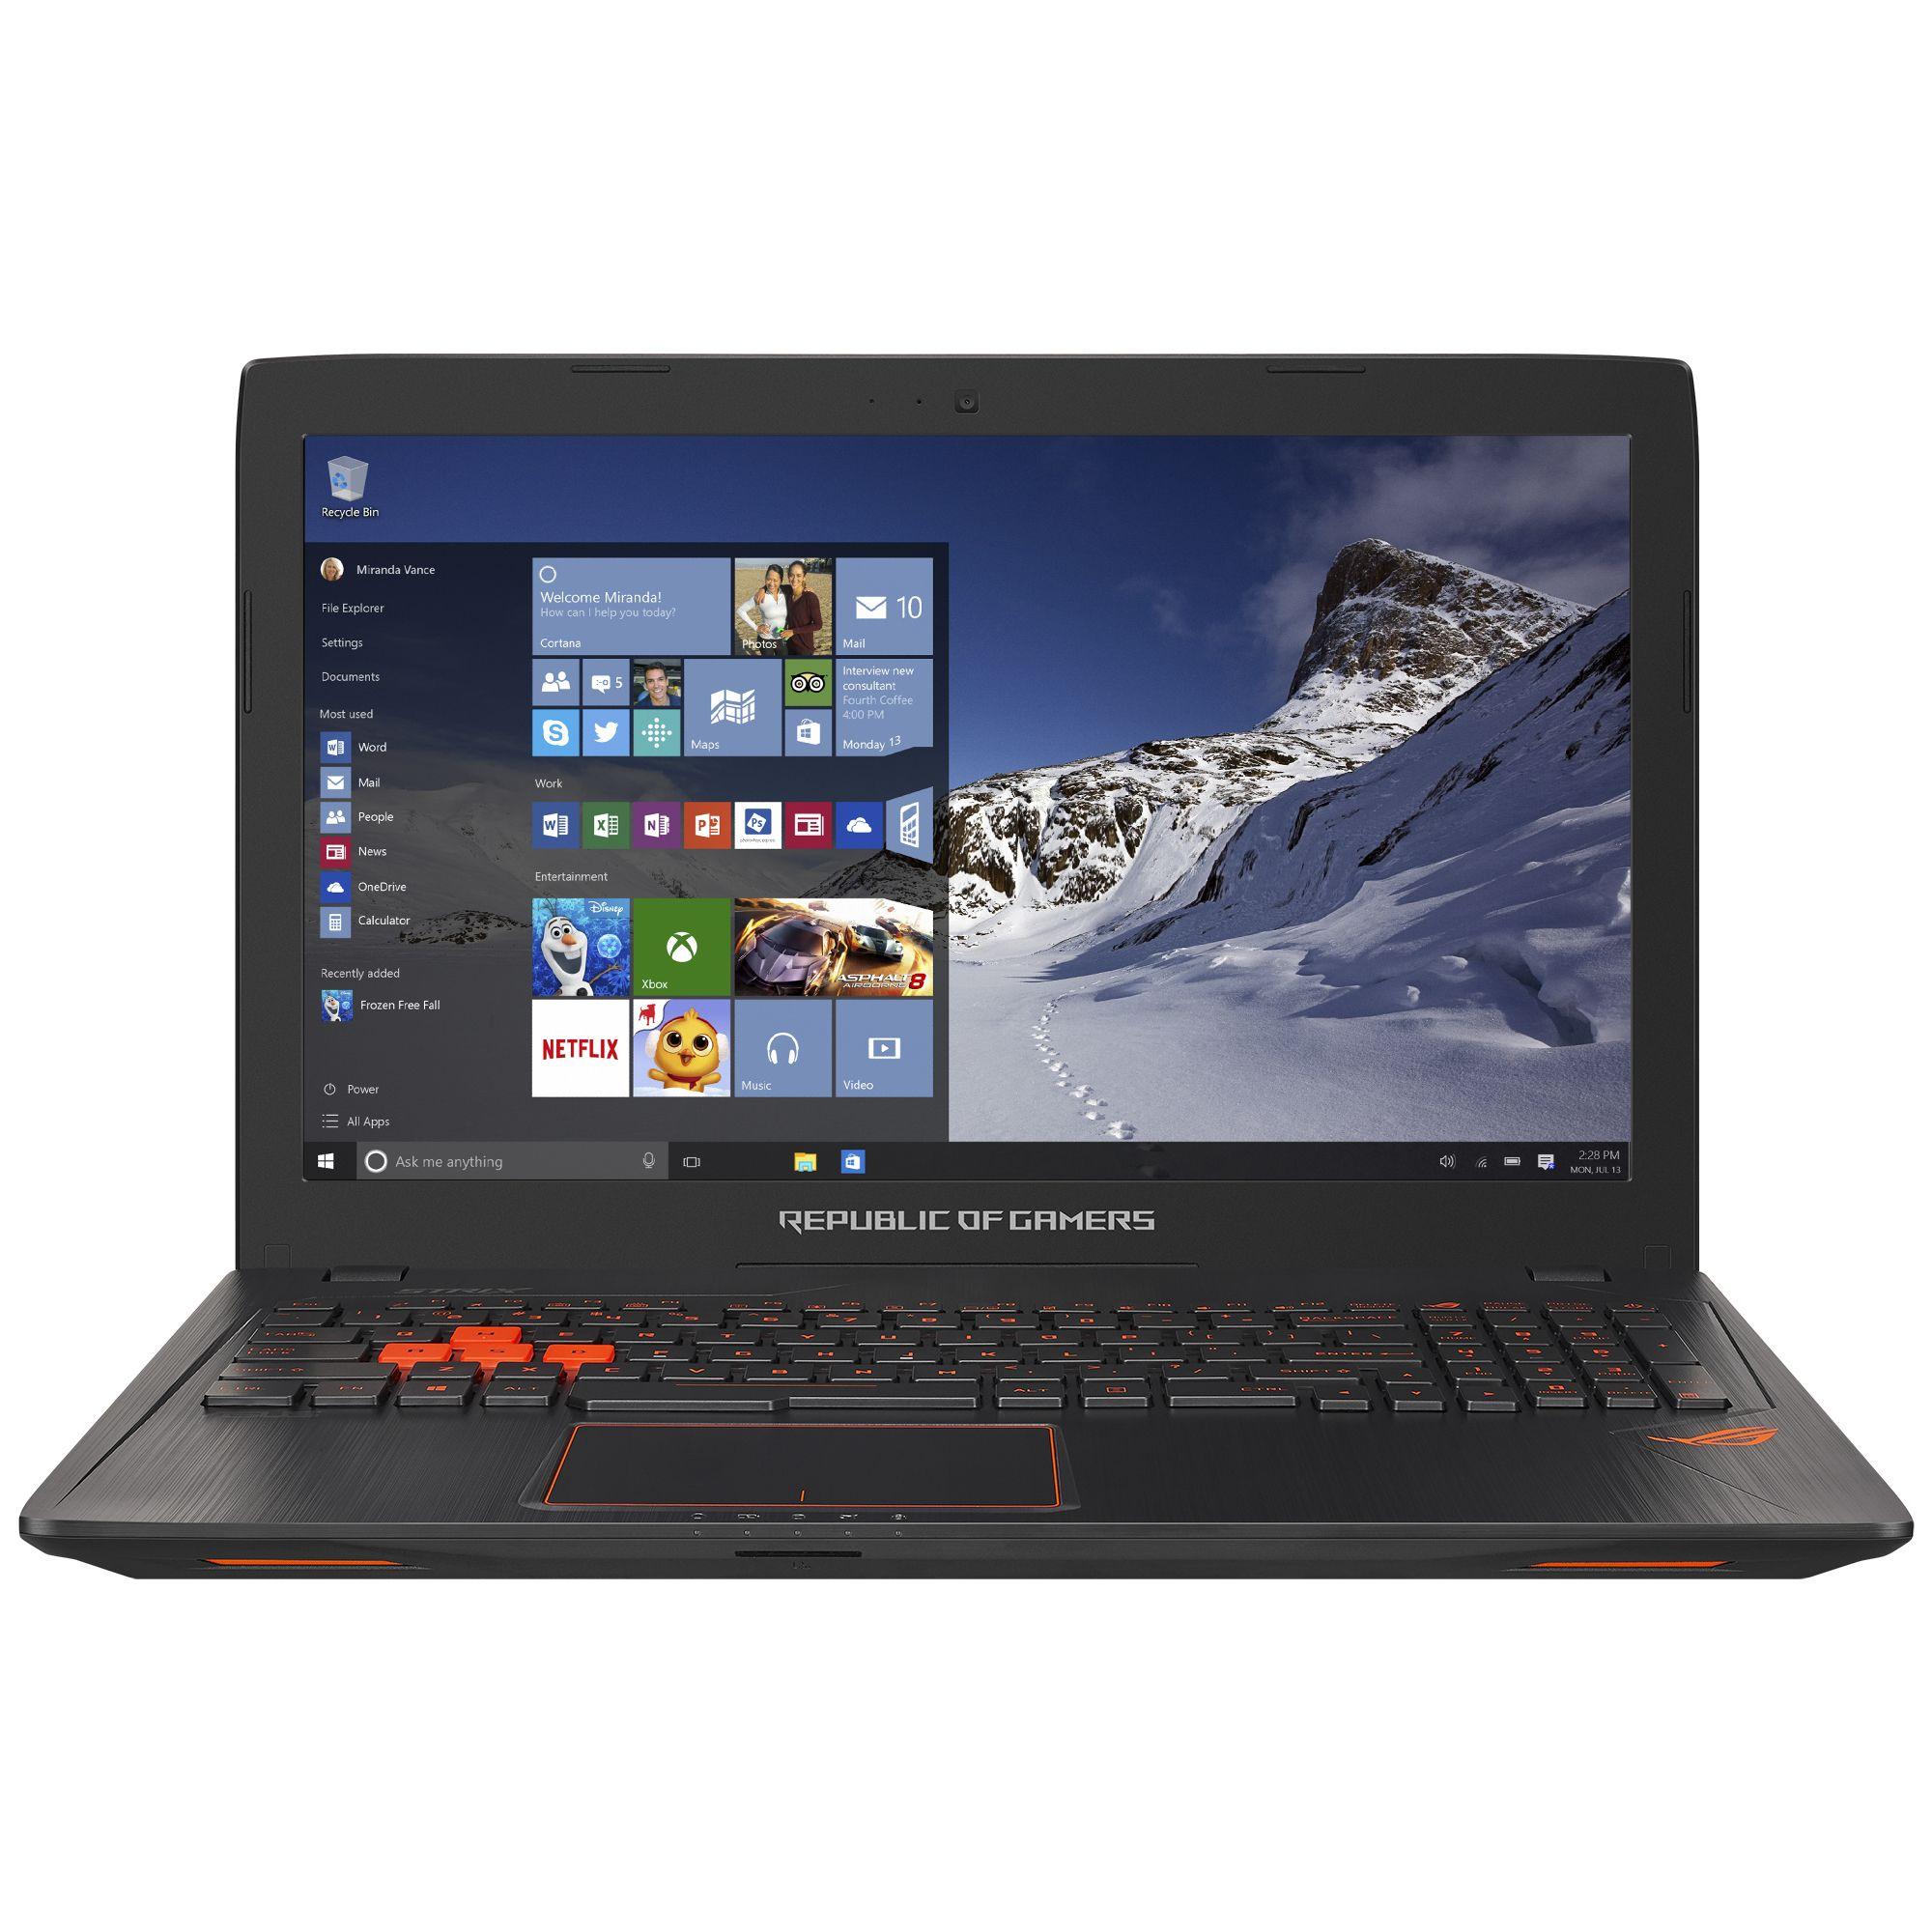 Notebook Asus ROG GL553VD 15.6 Full HD Intel Core i7-7700HQ GTX 1050-4GB RAM 8GB SSD 256GB Endless OS